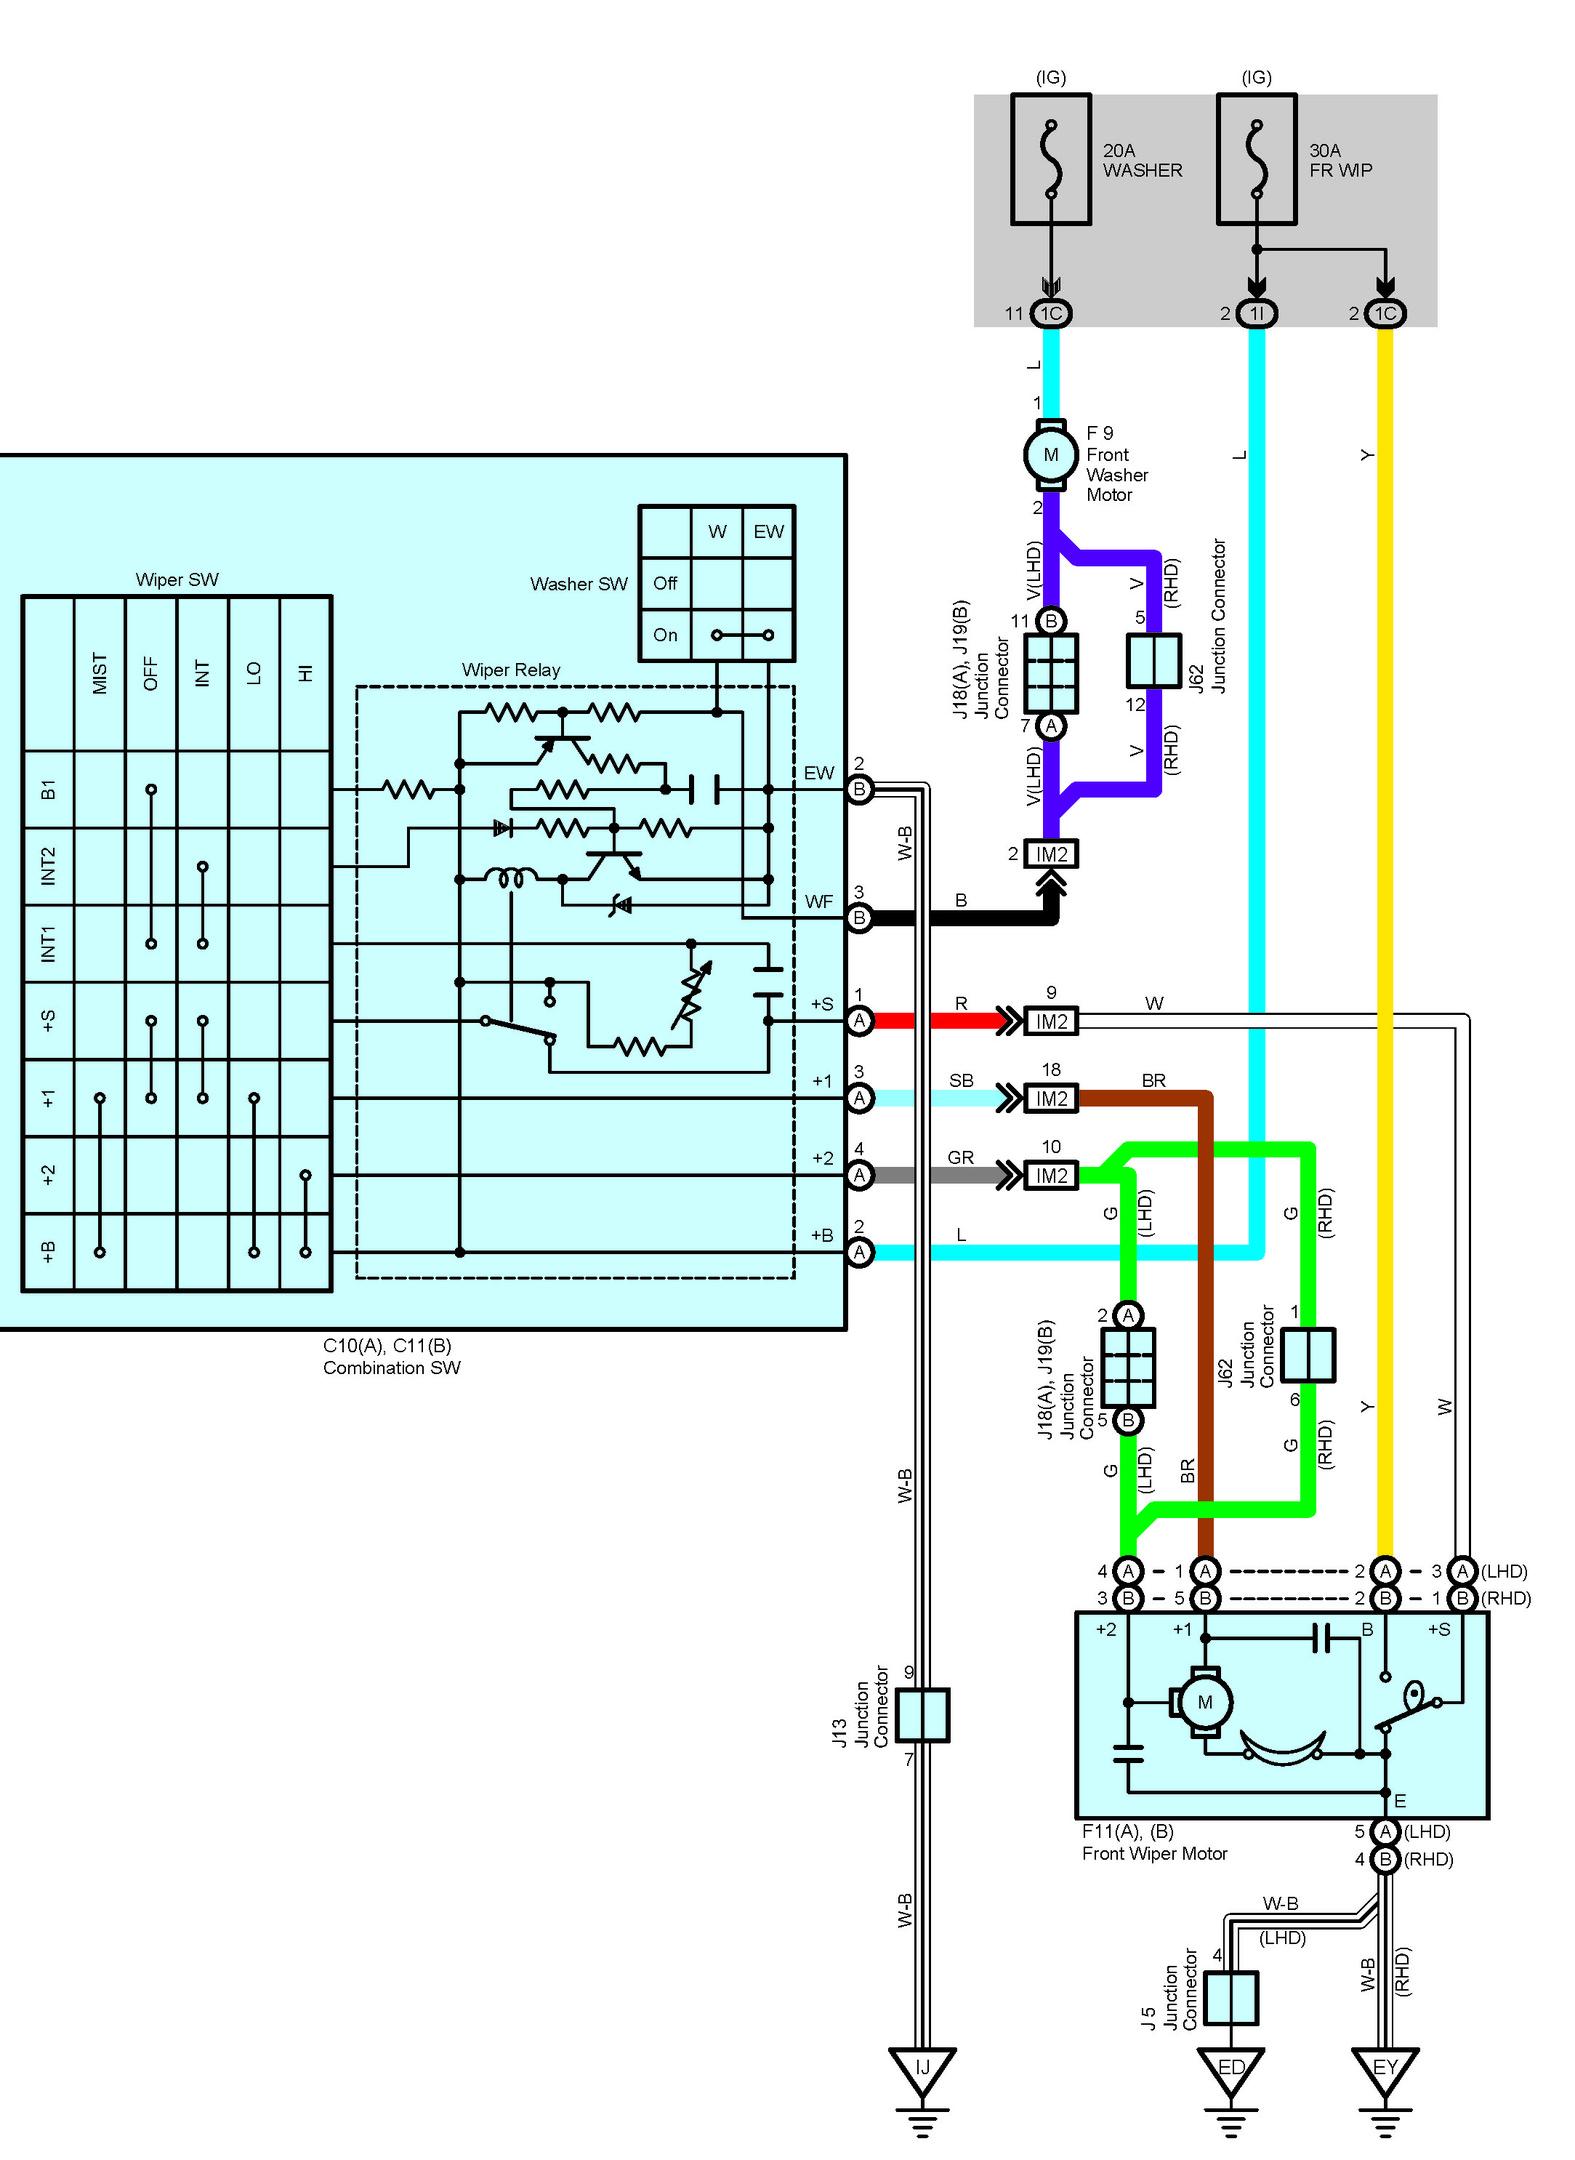 hight resolution of free 2005 lexus rx400h oem electrical wiring diagram rh sellfy com 2006 lexus rx400h wiring diagram